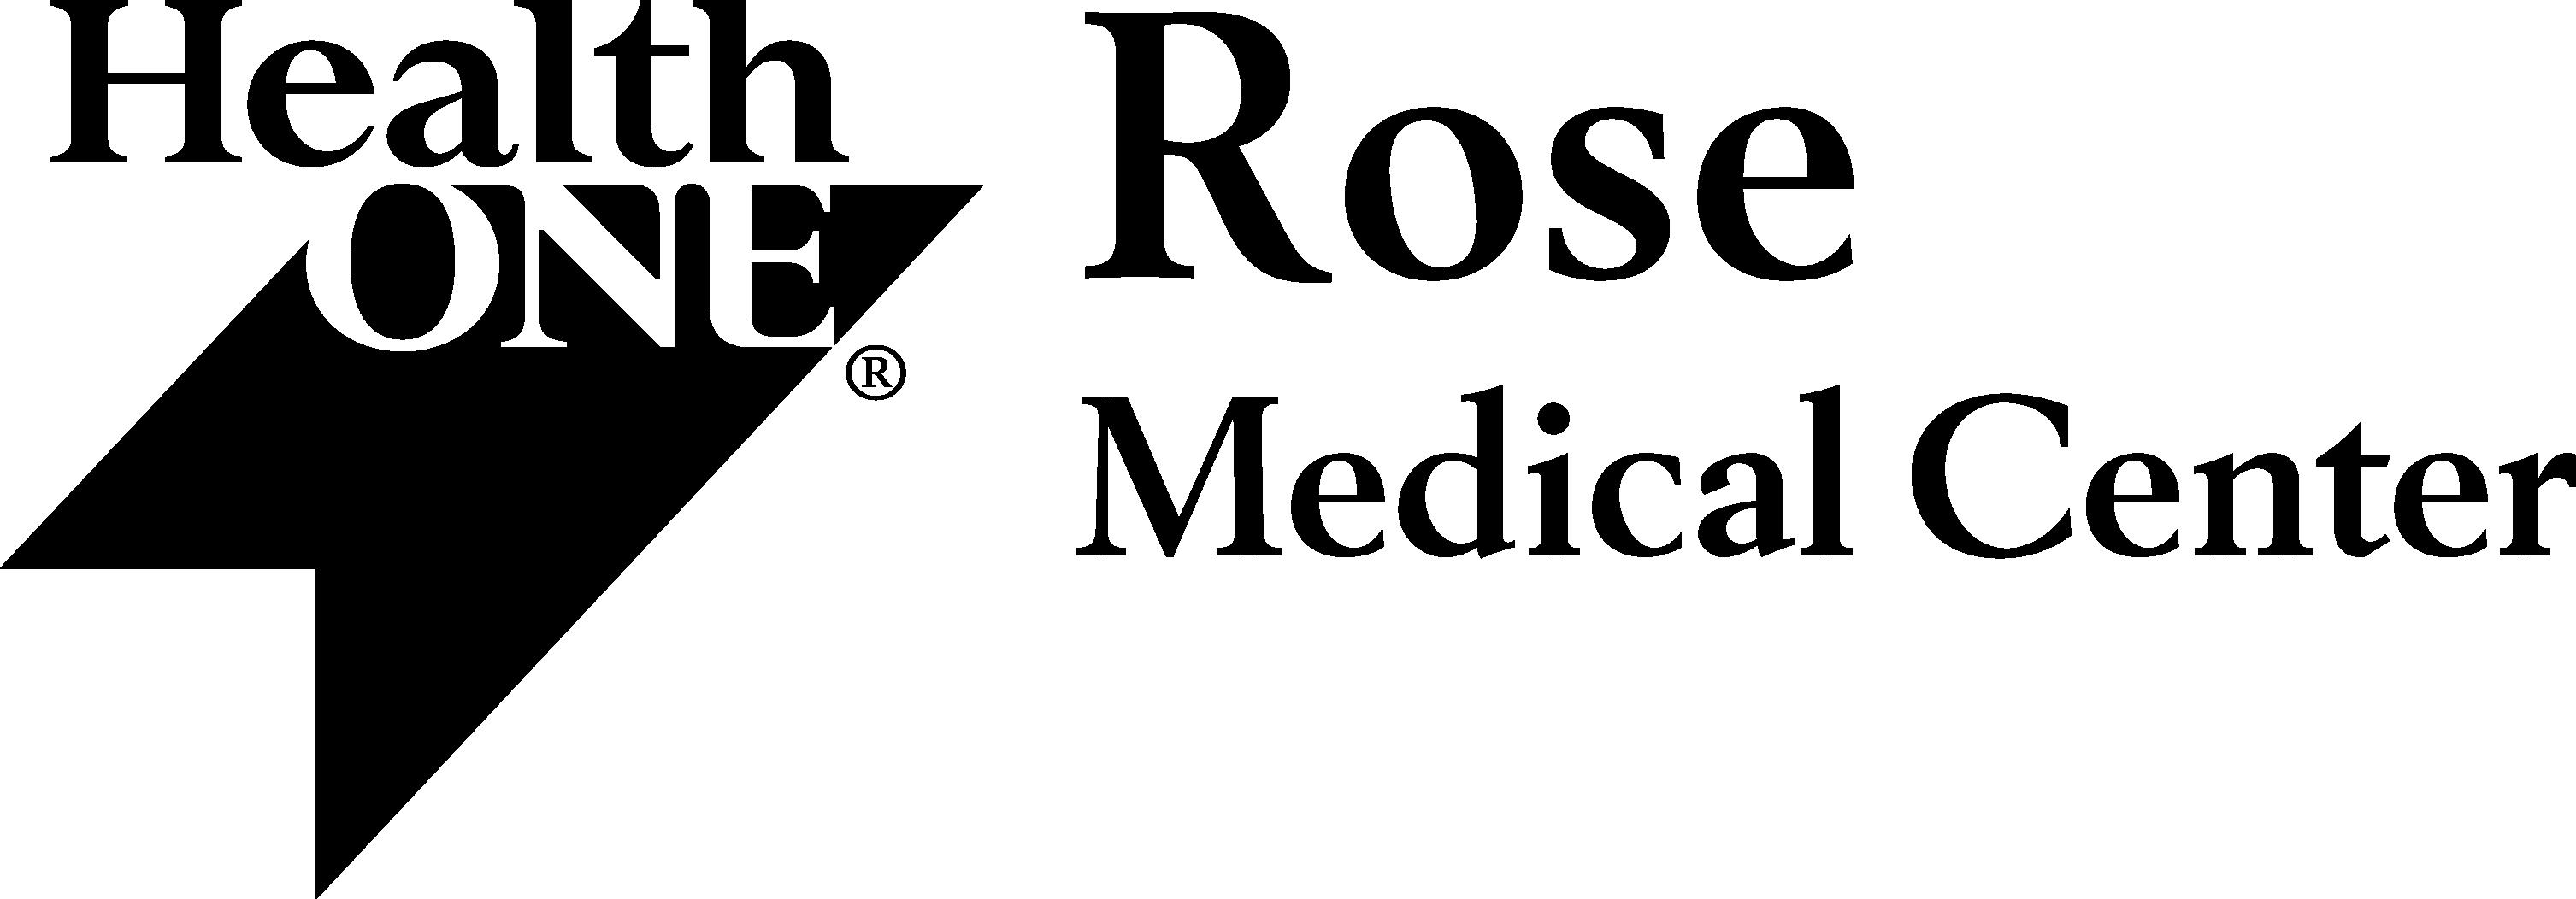 Rose Medical Center logo